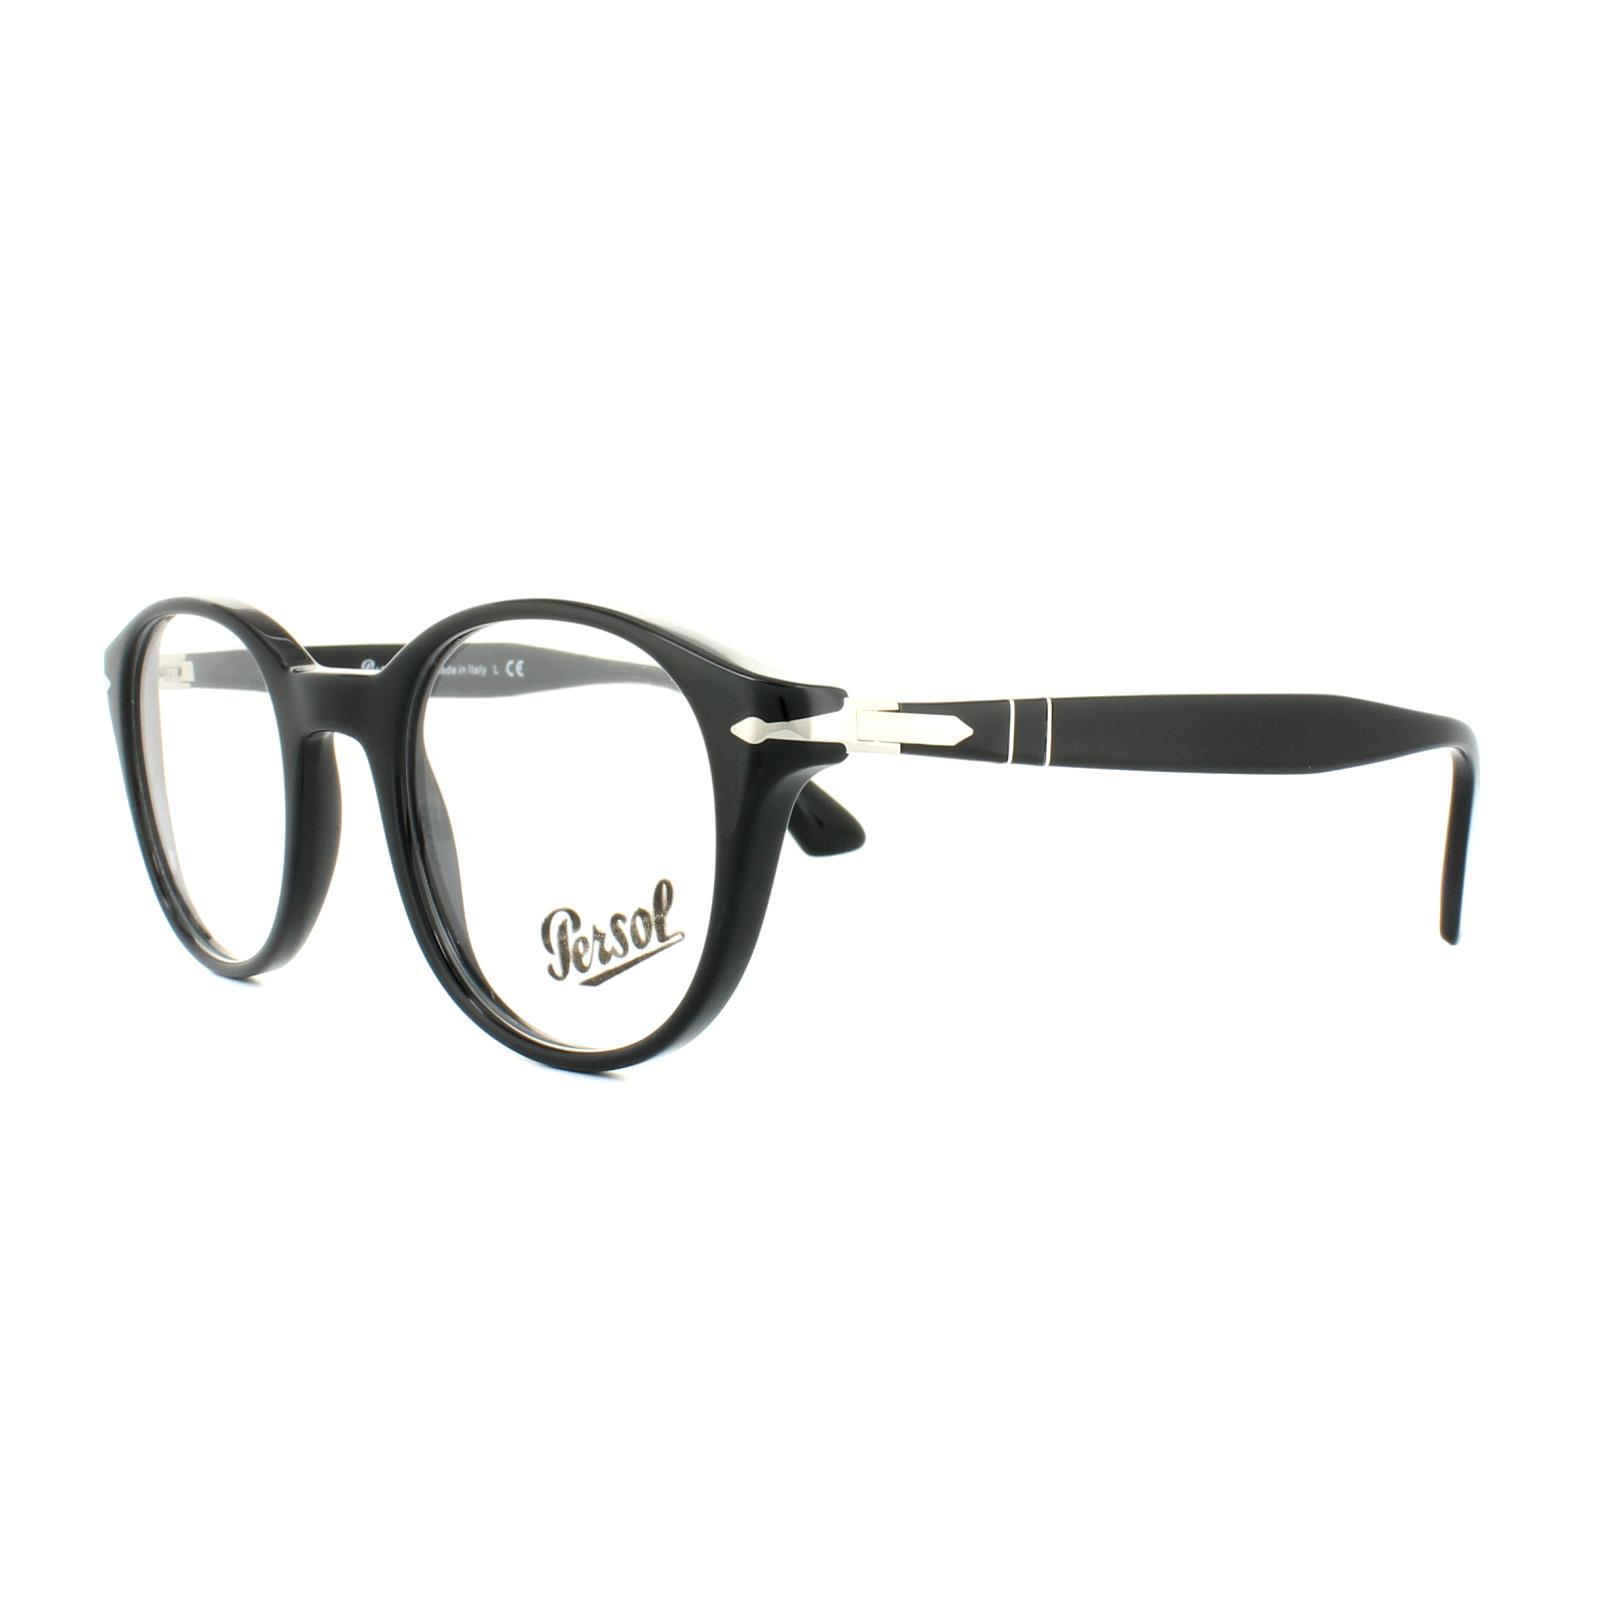 Persol Glasses Frames PO 3144V 95 Black Mens 47mm 8053672593945 | eBay